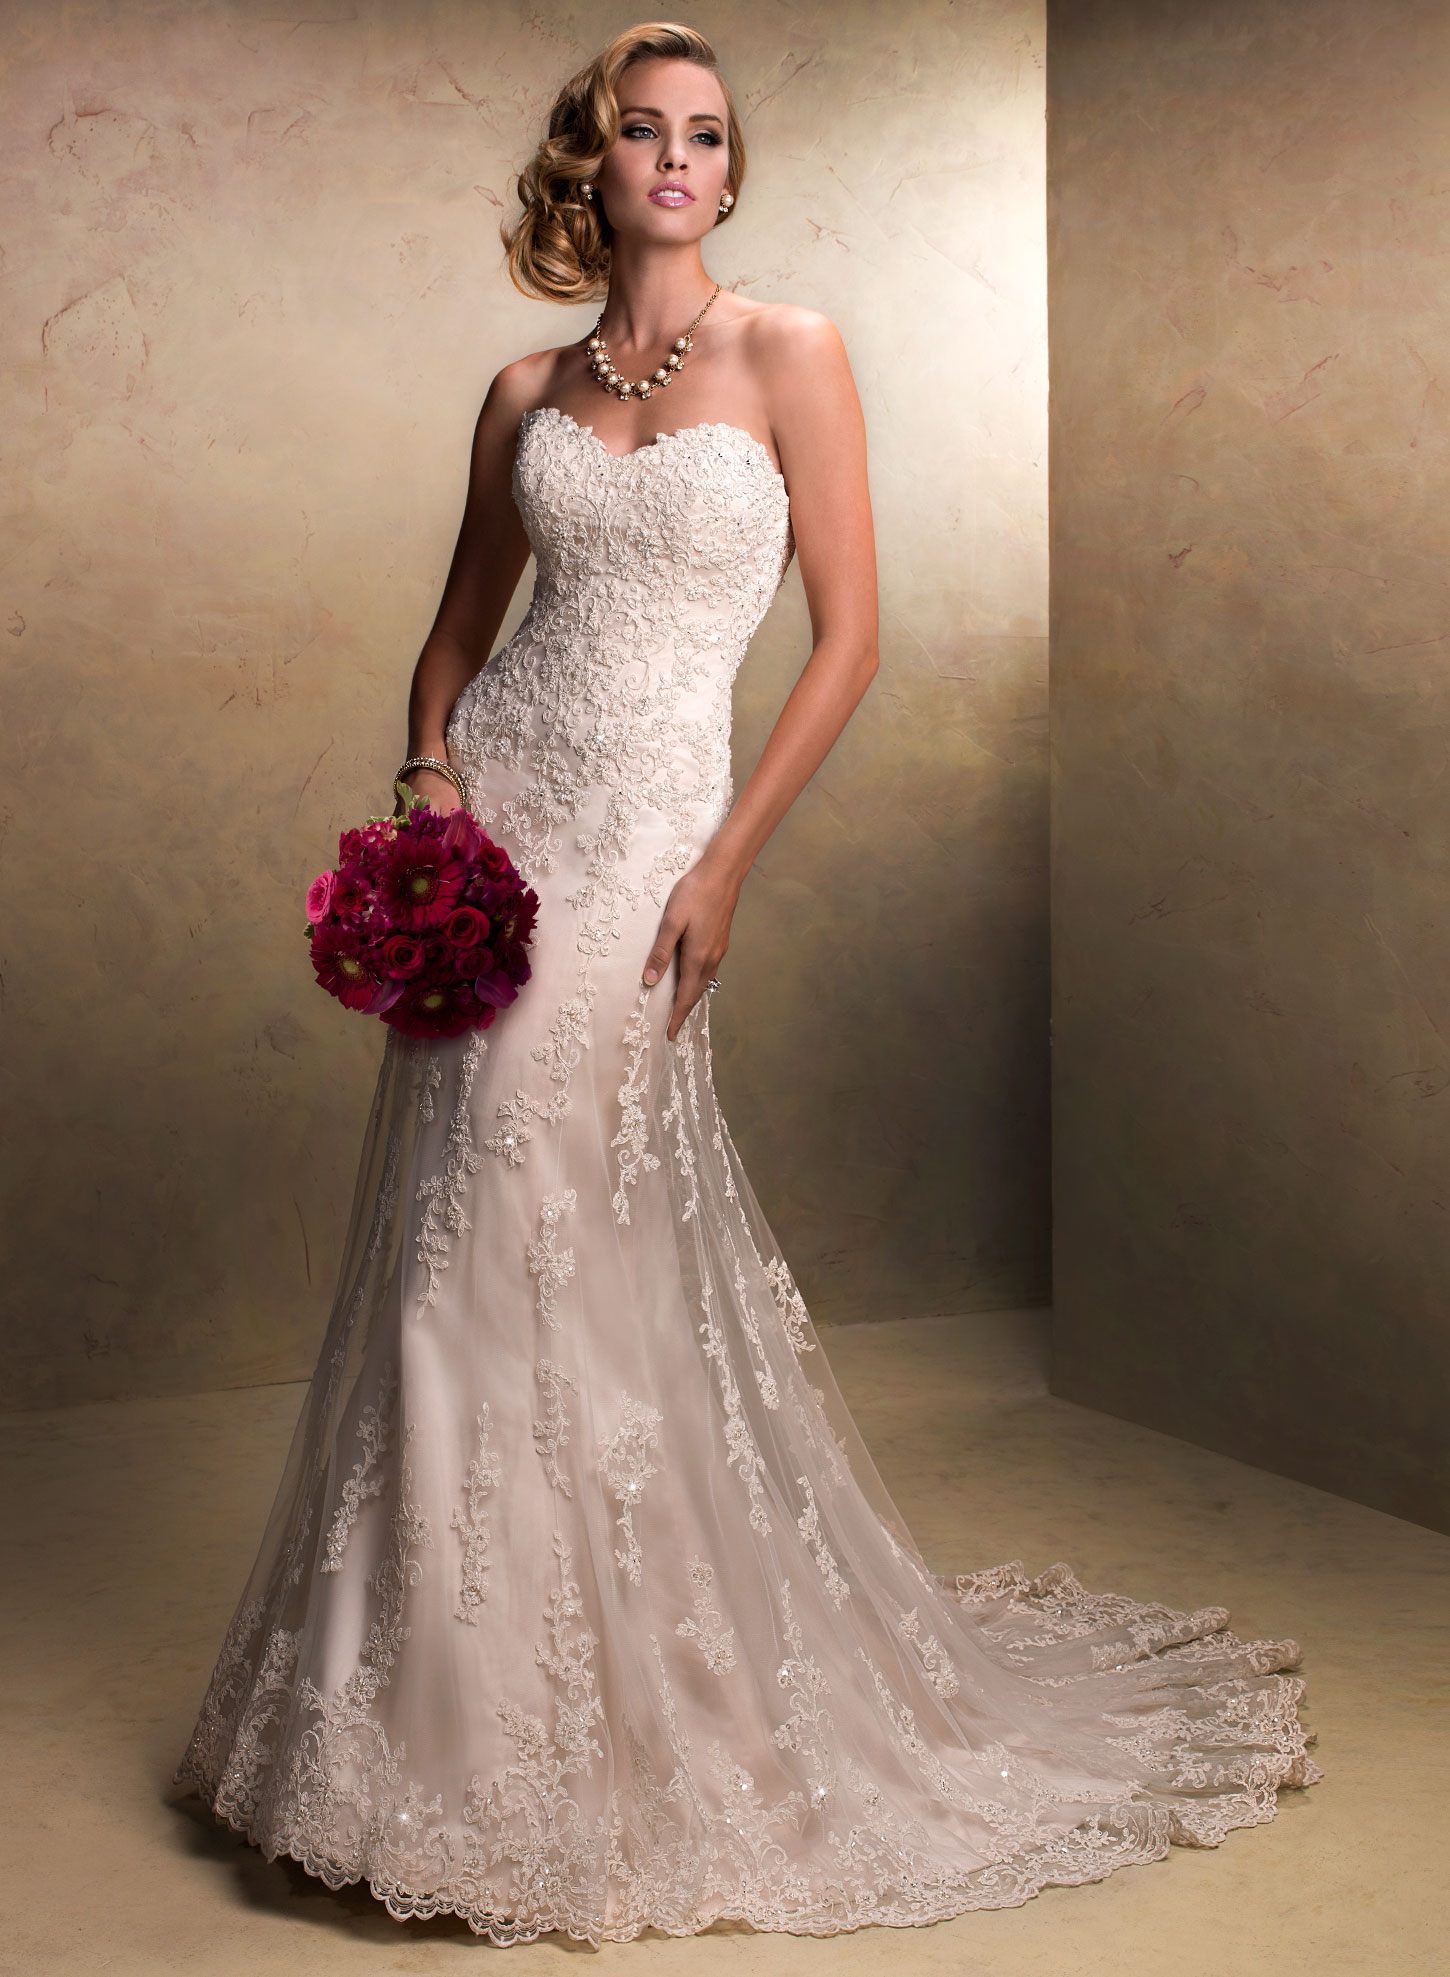 wedding dresses maggie sottero photo - 1